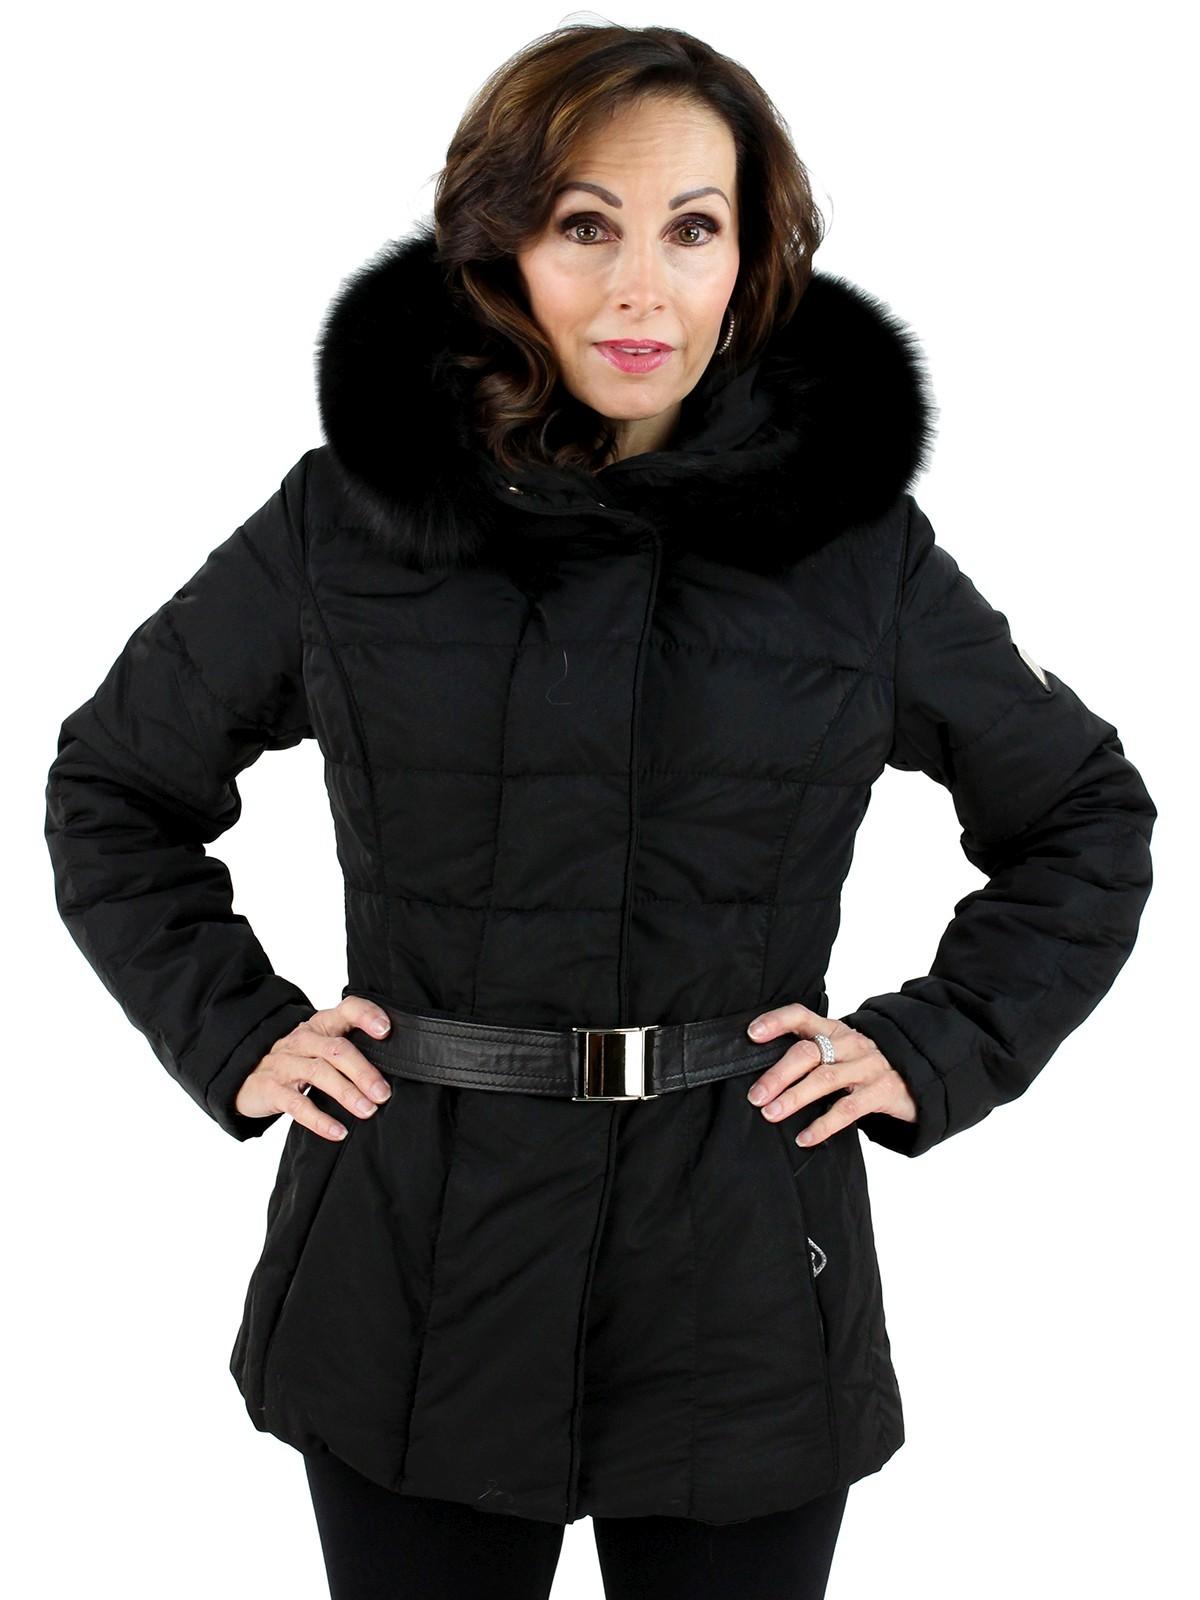 Gorski Woman's  Black Apres Ski Jacket with Black Fox Trimmed Hood